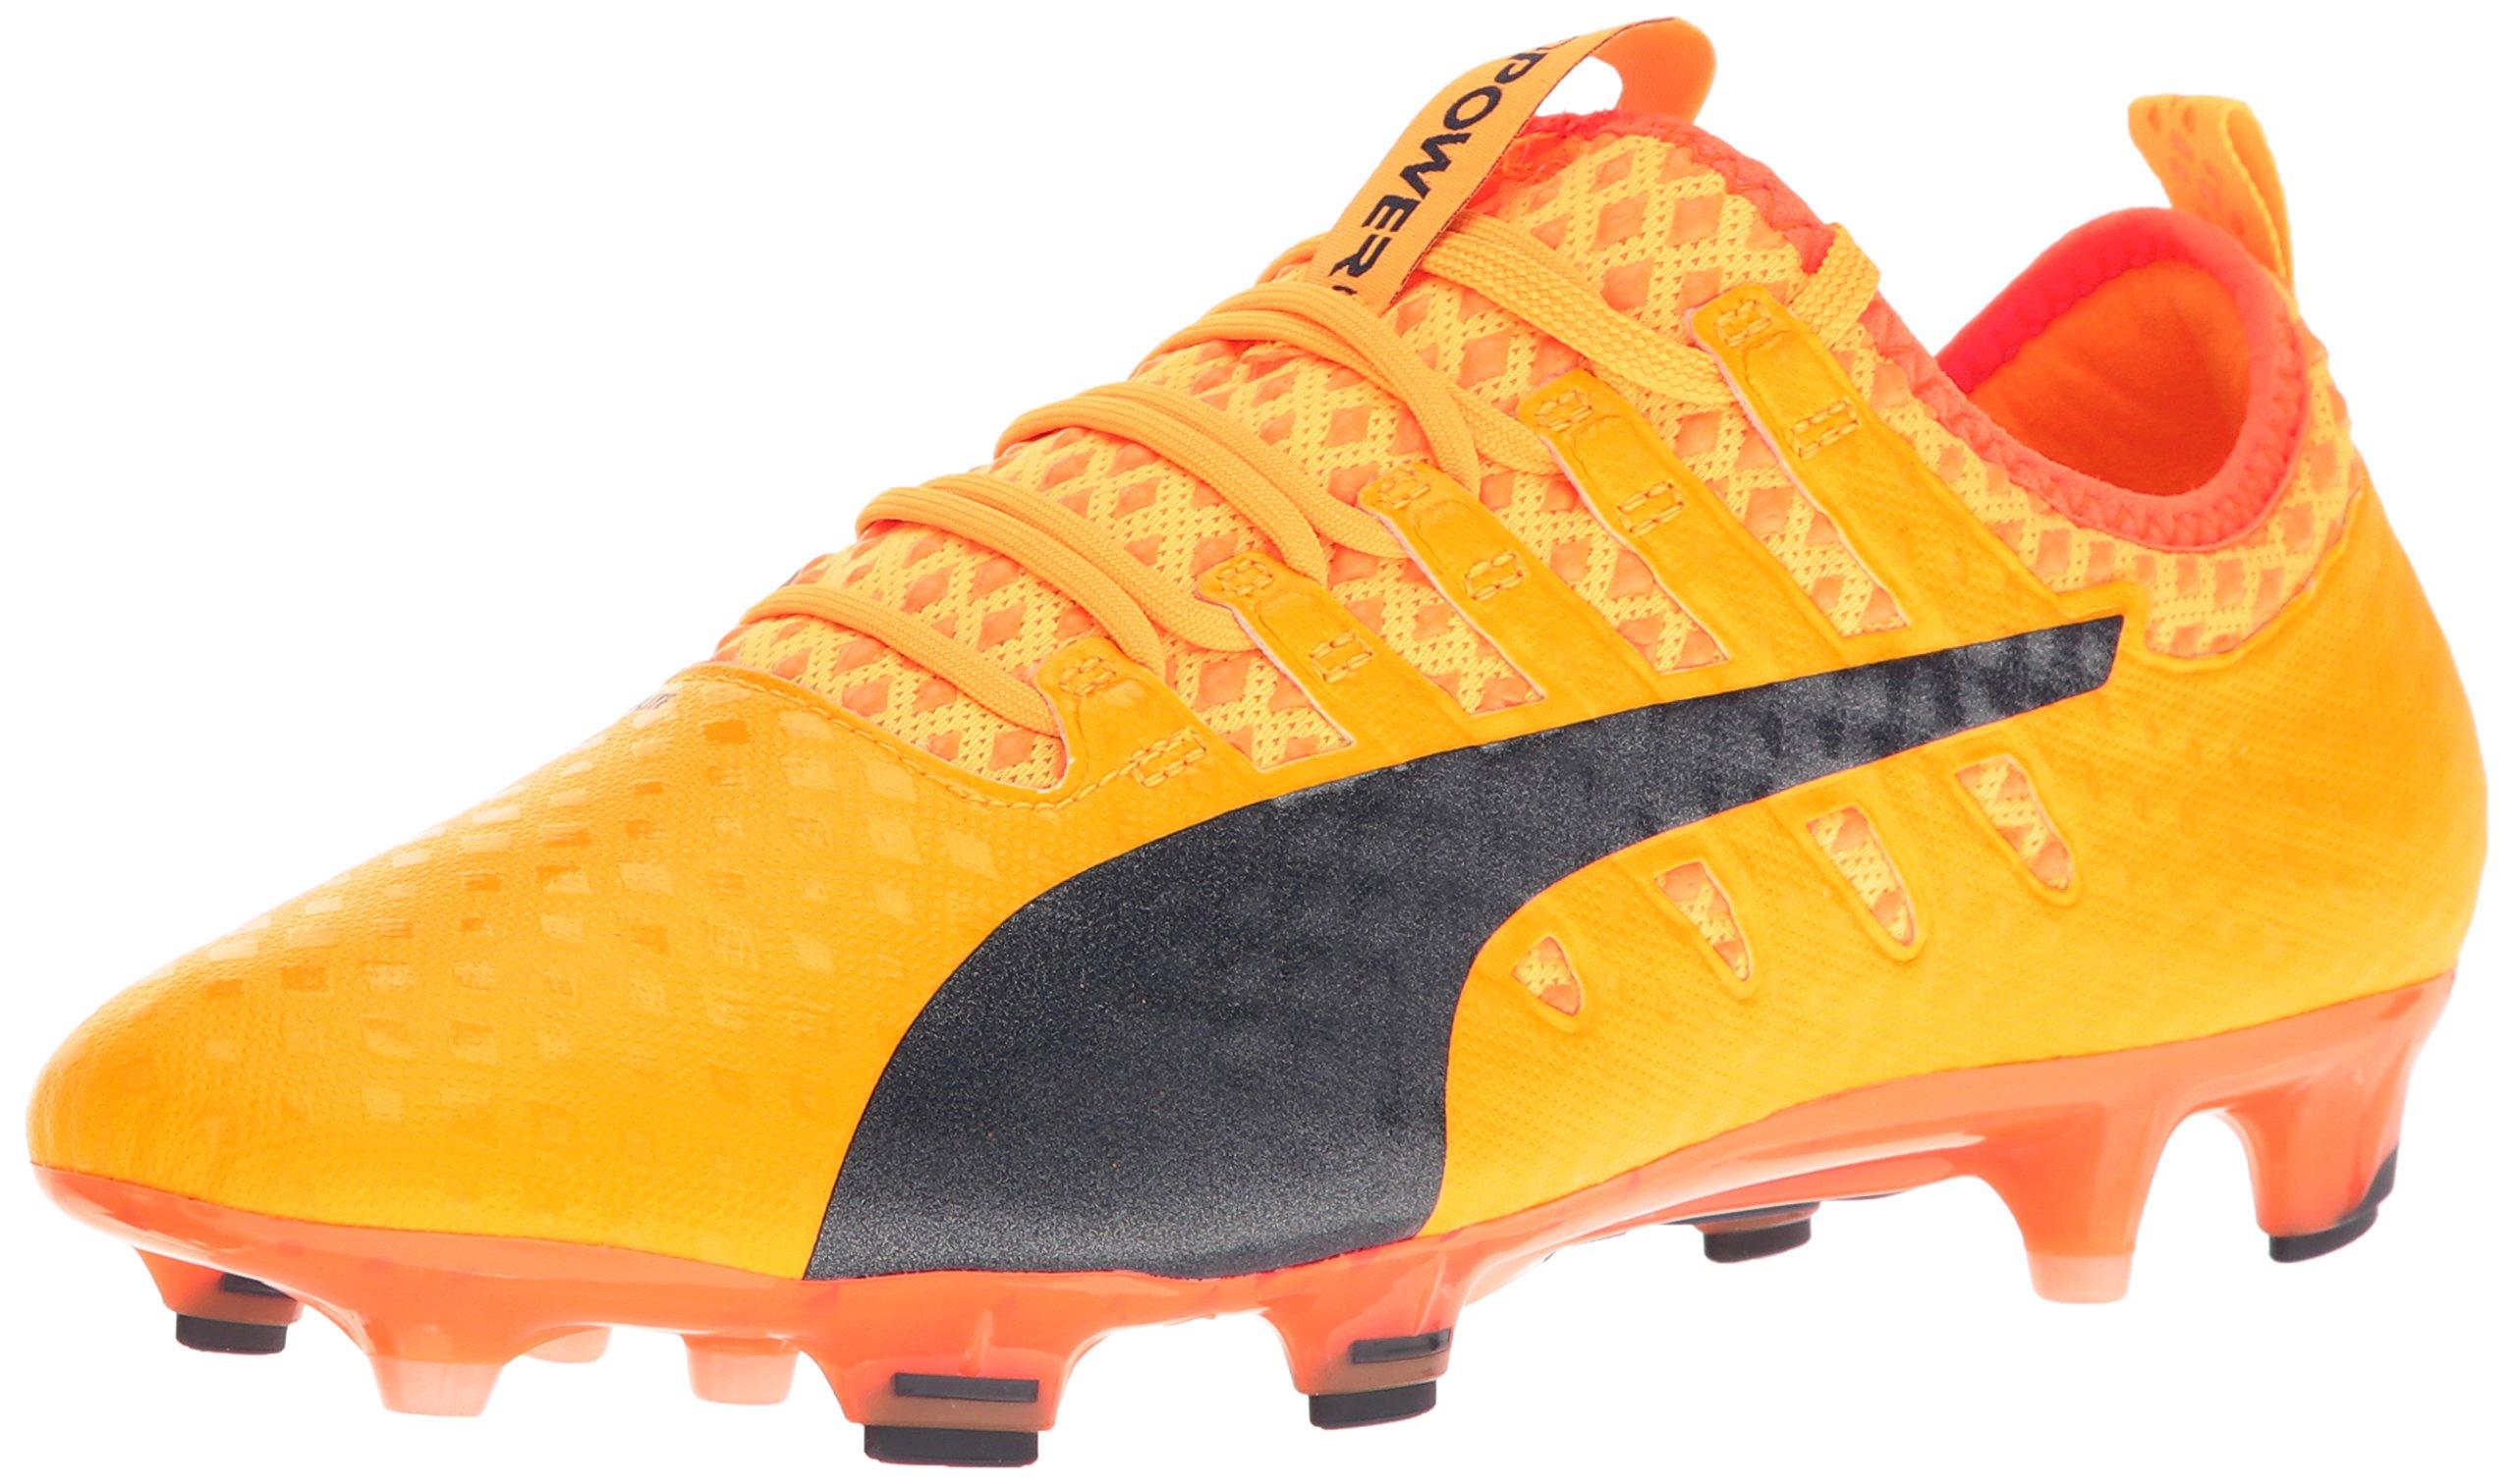 PUMA Men's Evopower Vigor 1 FG Soccer Shoe, Ultra Yellow-Peacoat-Orange Clown Fish, 12 M US